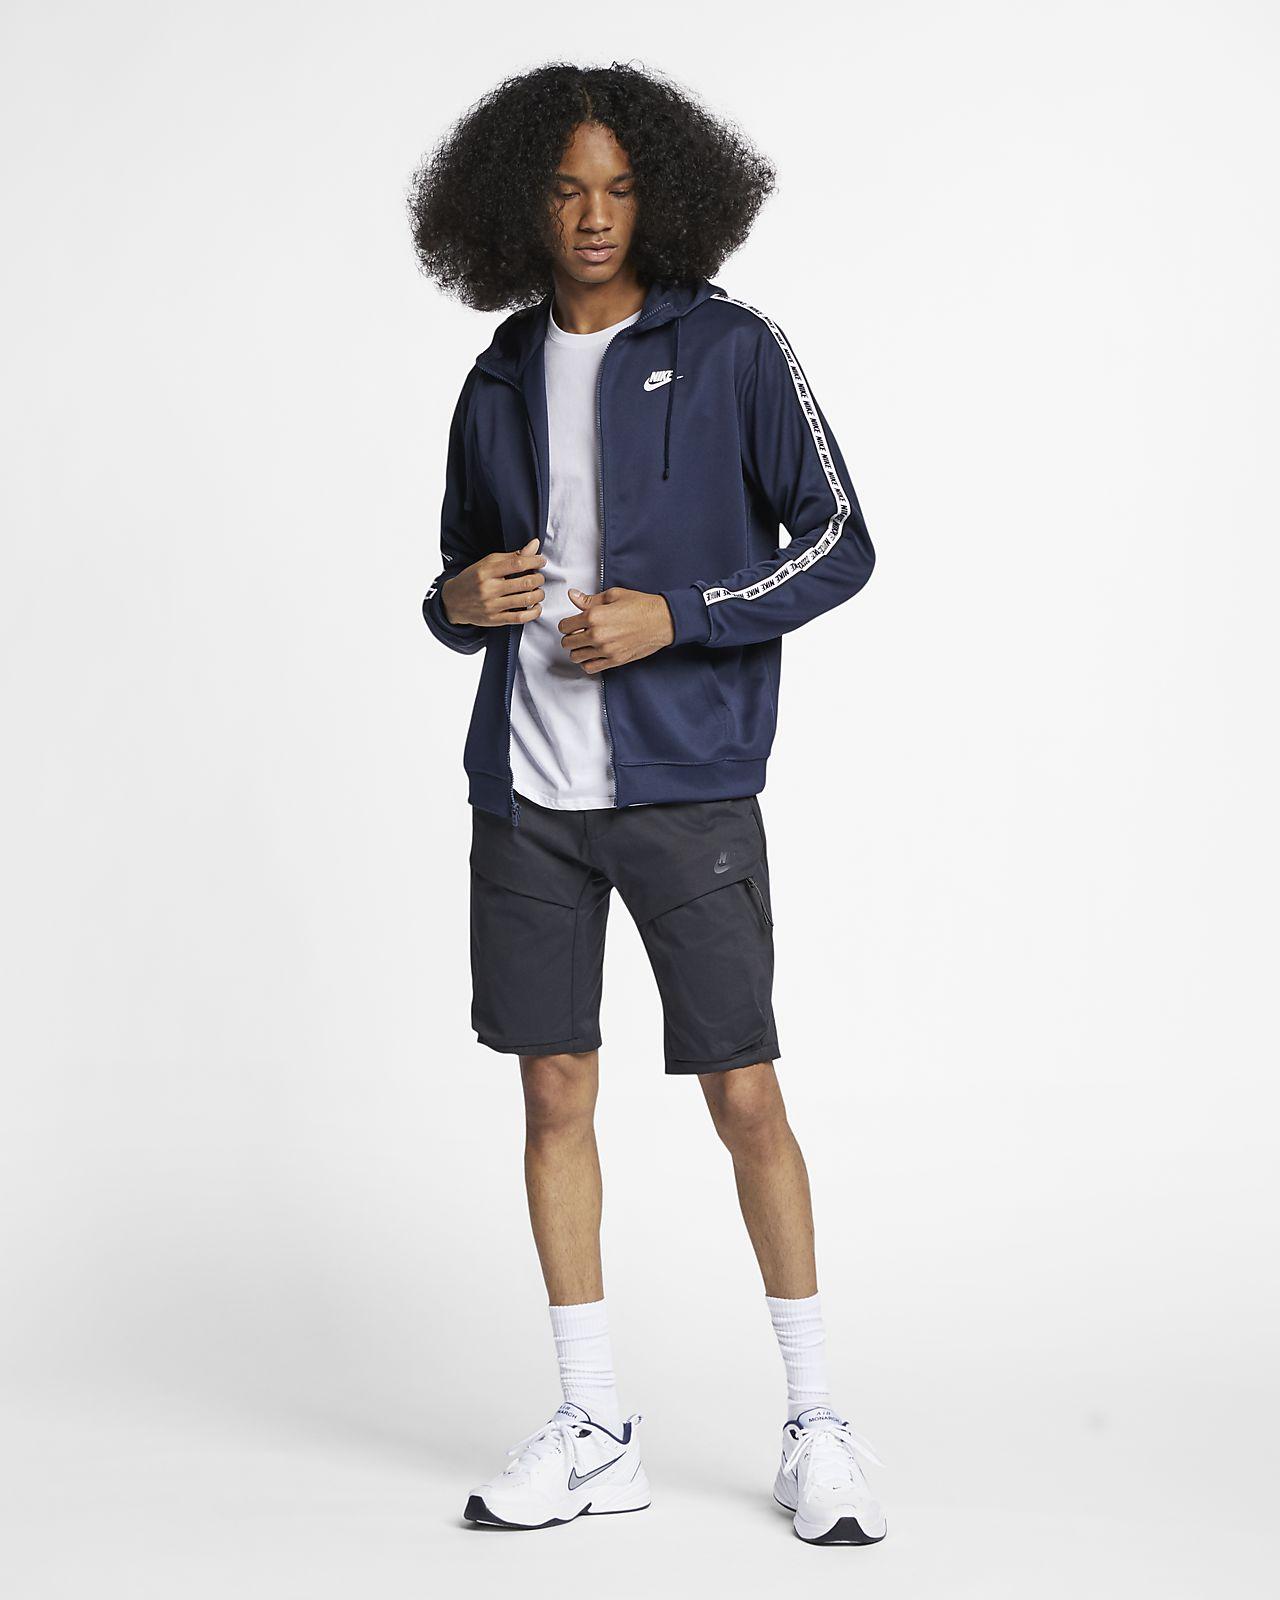 Nike Sportswear Dessuadora amb caputxa i cremallera completa - Home